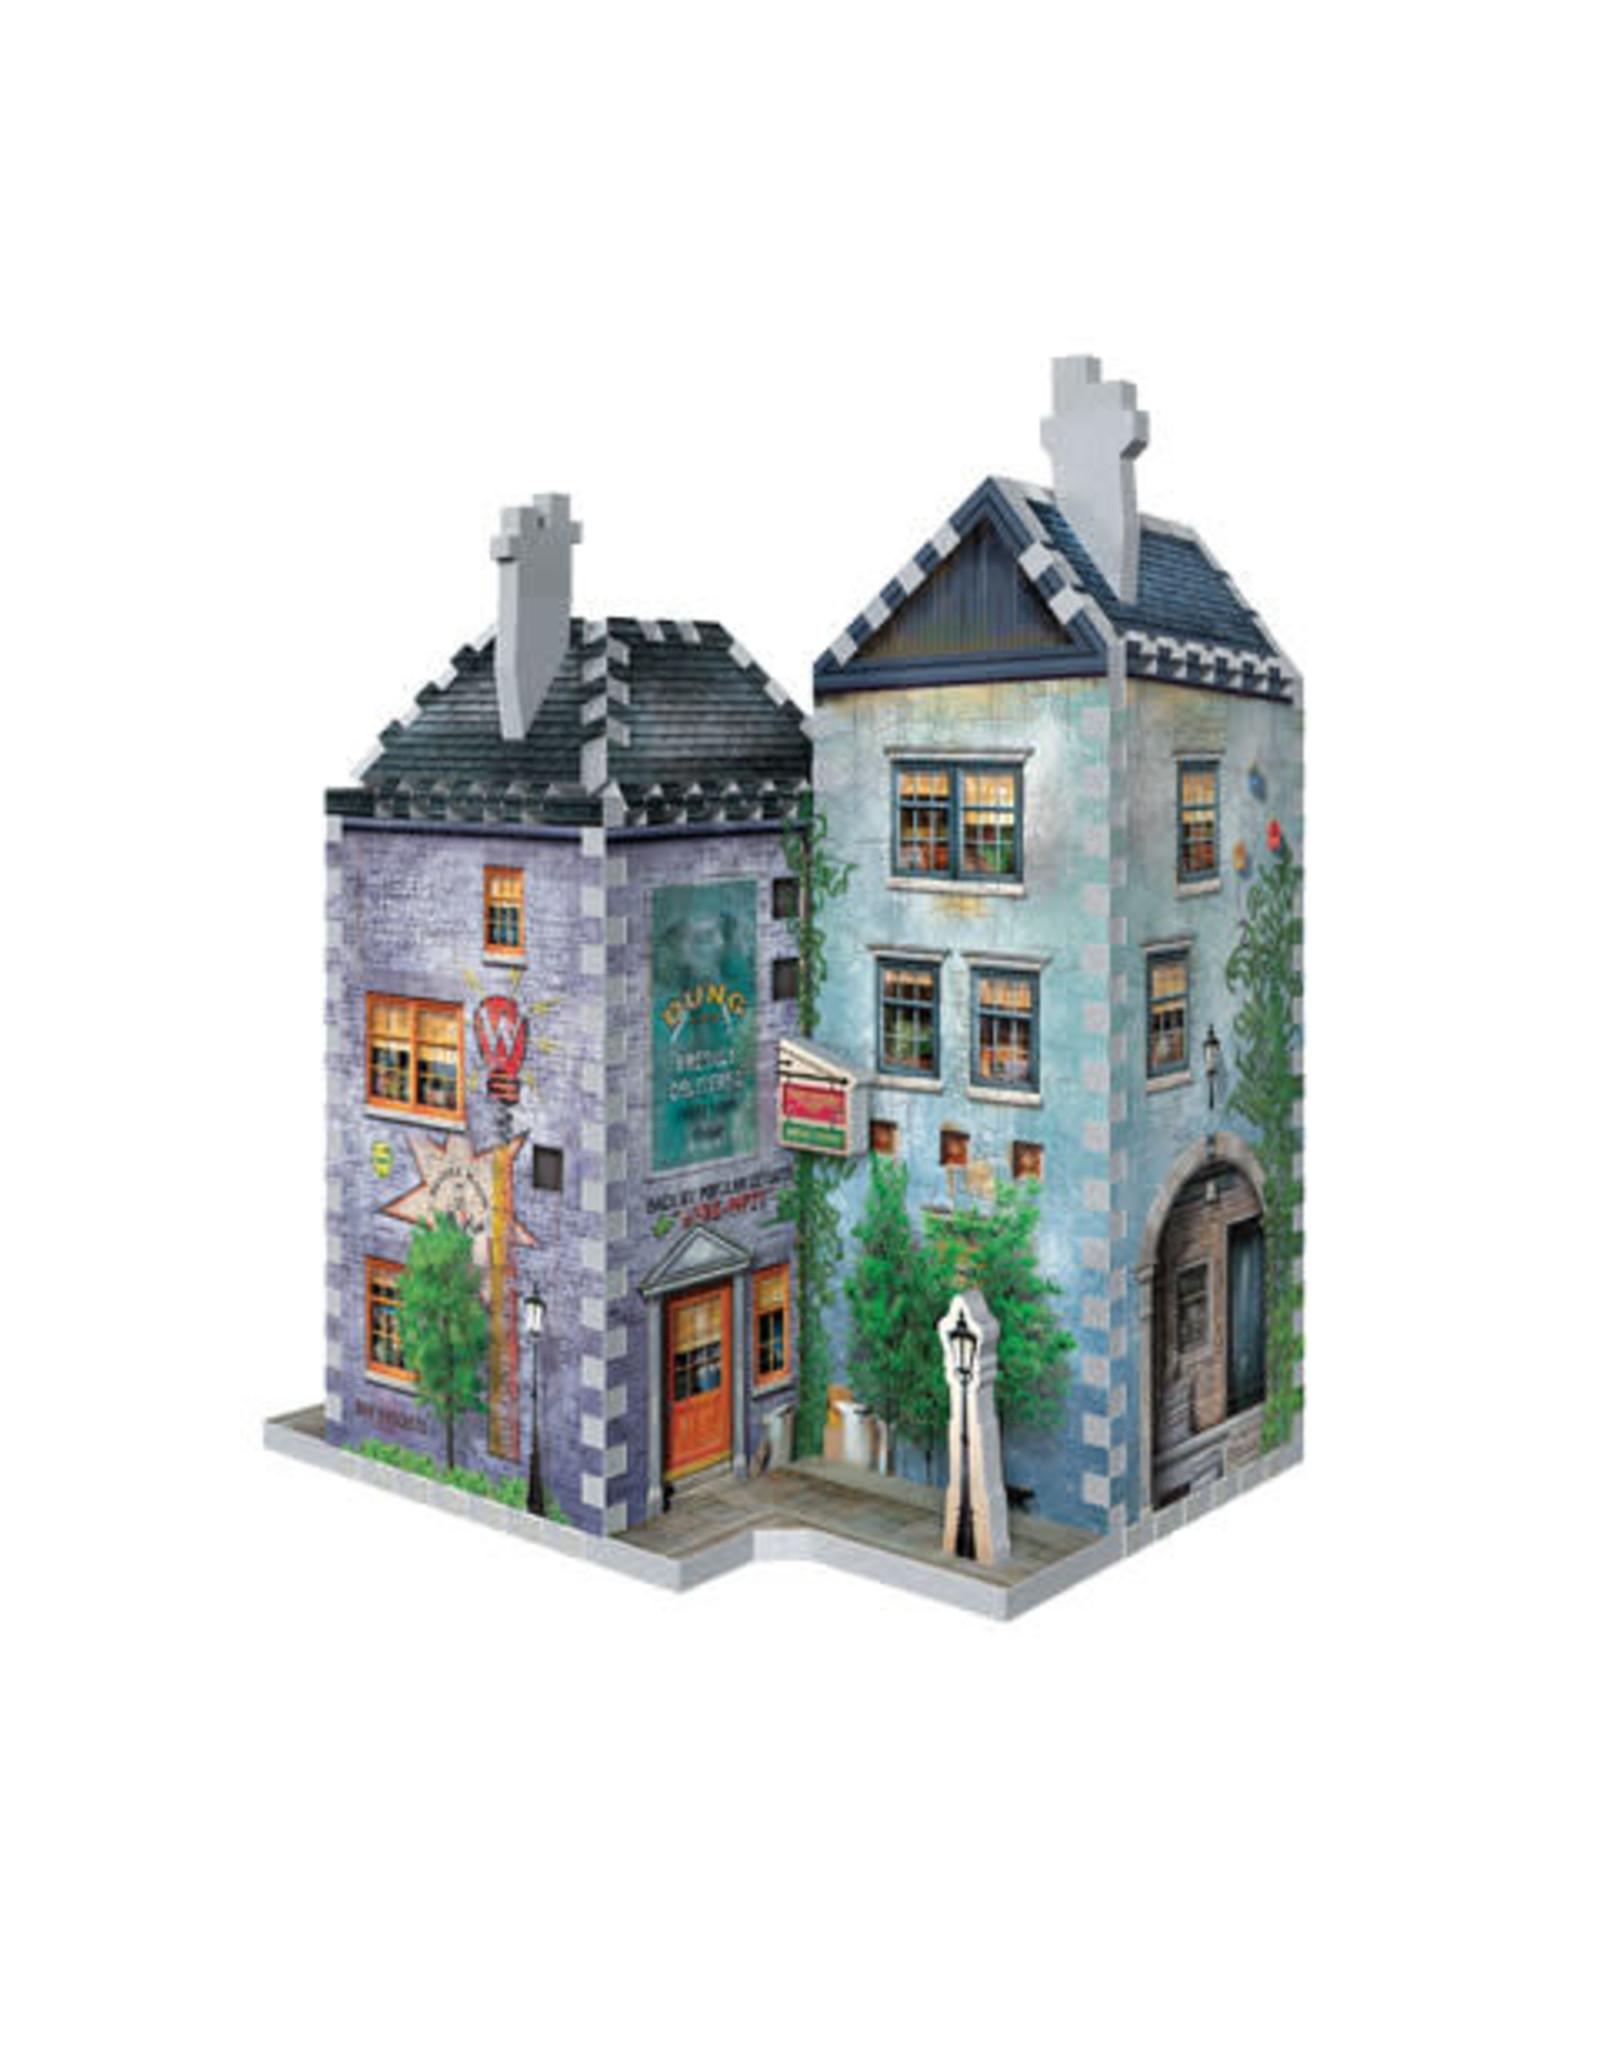 Wrebbit Puzzles HARRY POTTER 3D Puzzle 285P - Weasleys Wizard Wheezes